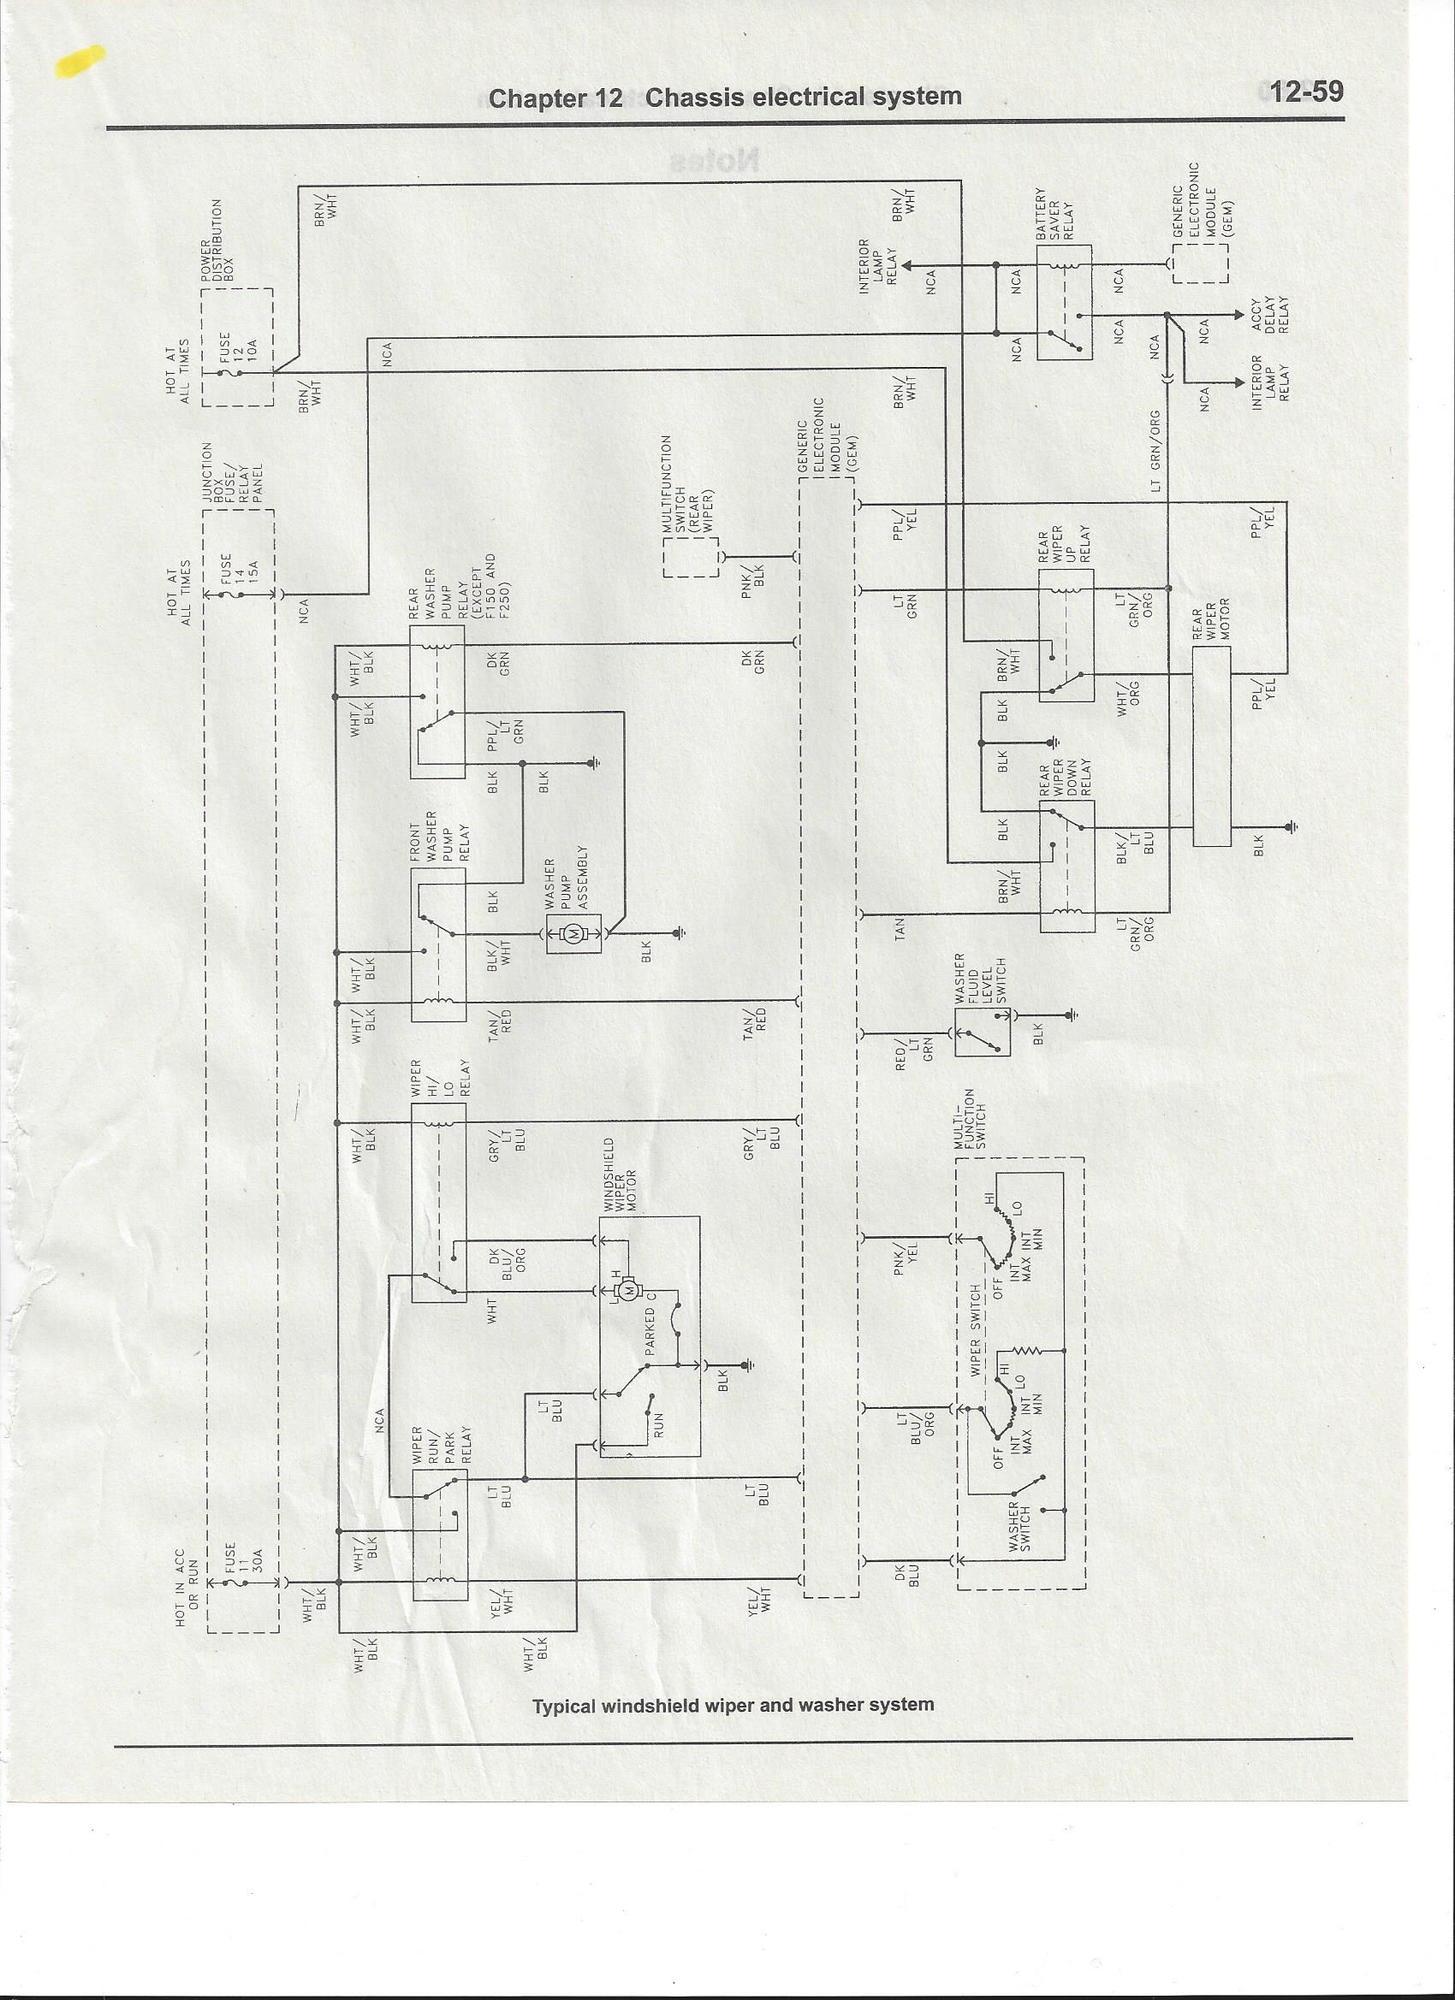 complete excursion wiring diagrams     so far - page 2